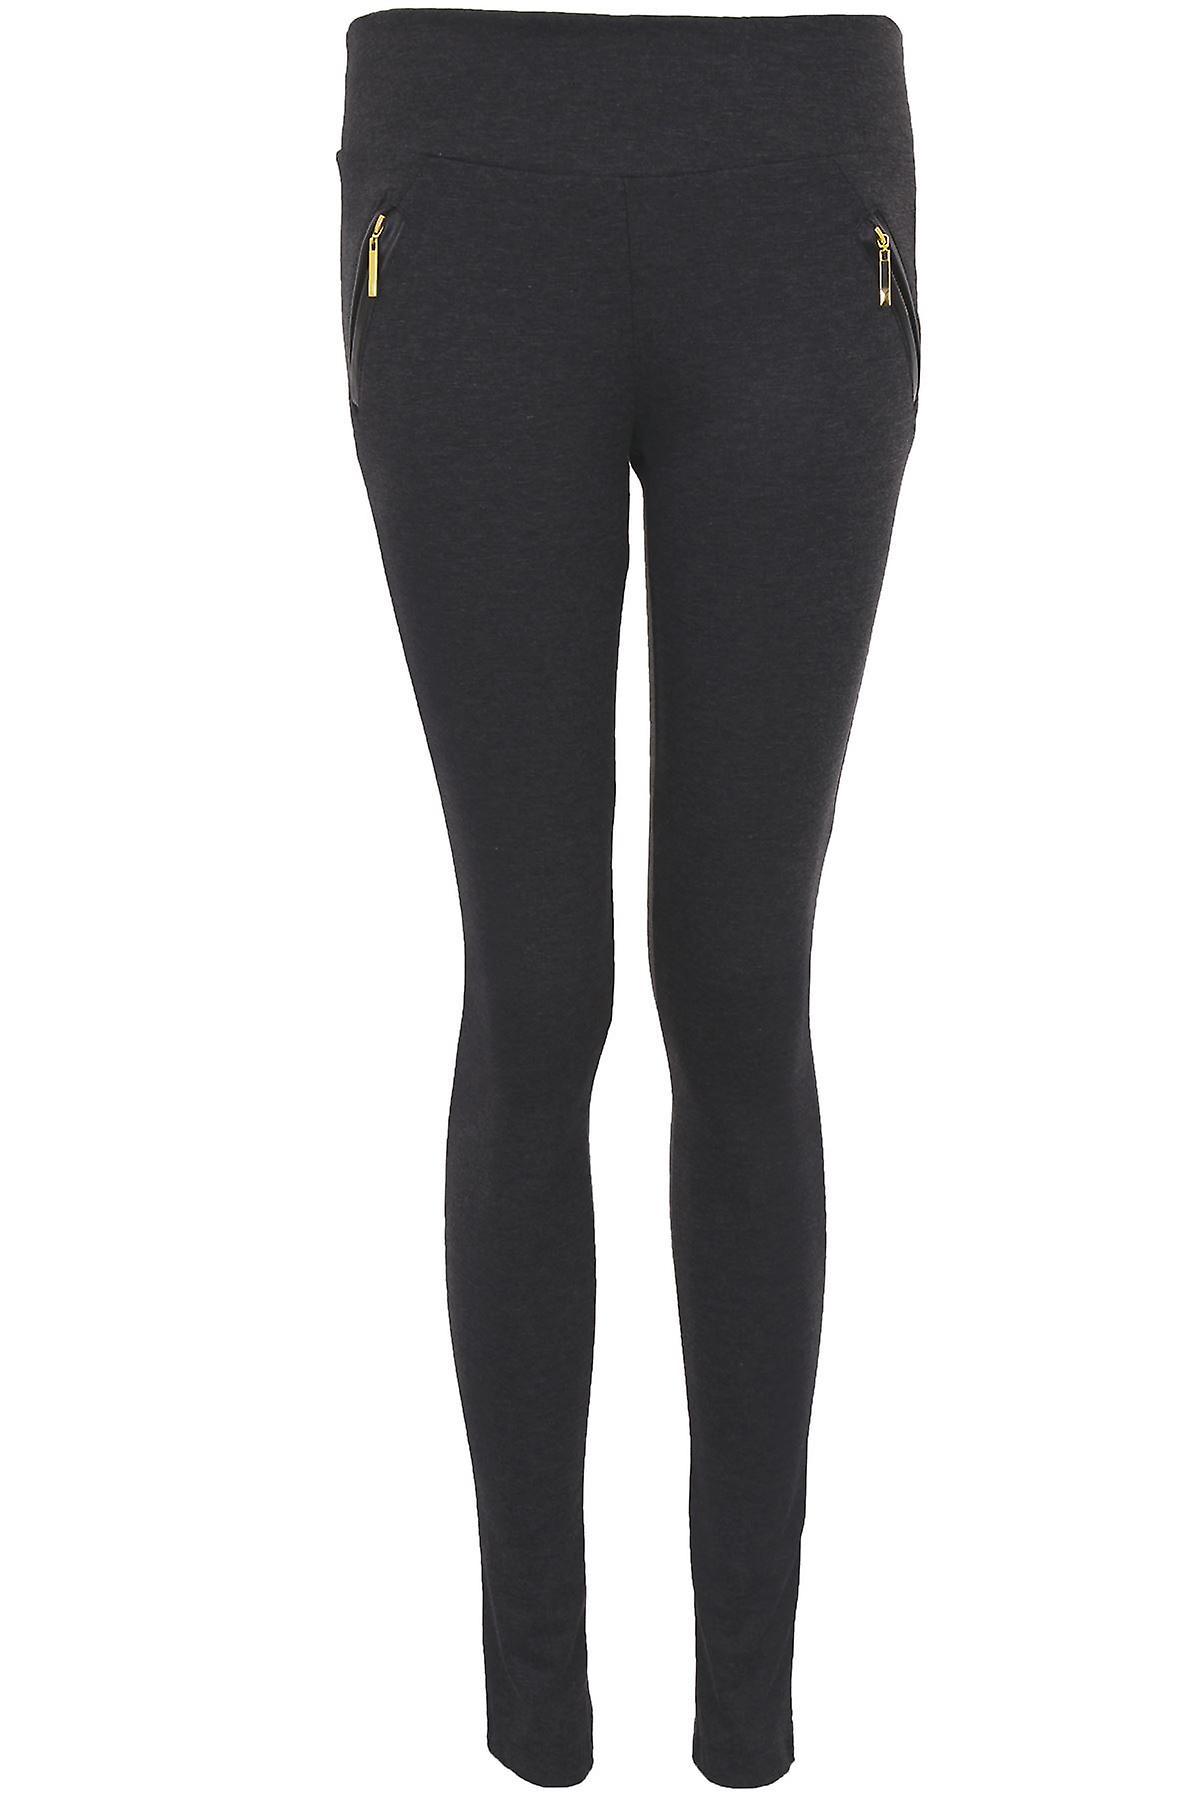 Ladies Skinny Fit Gold Zip Pockets Women's Smart Office Jeggings Trousers